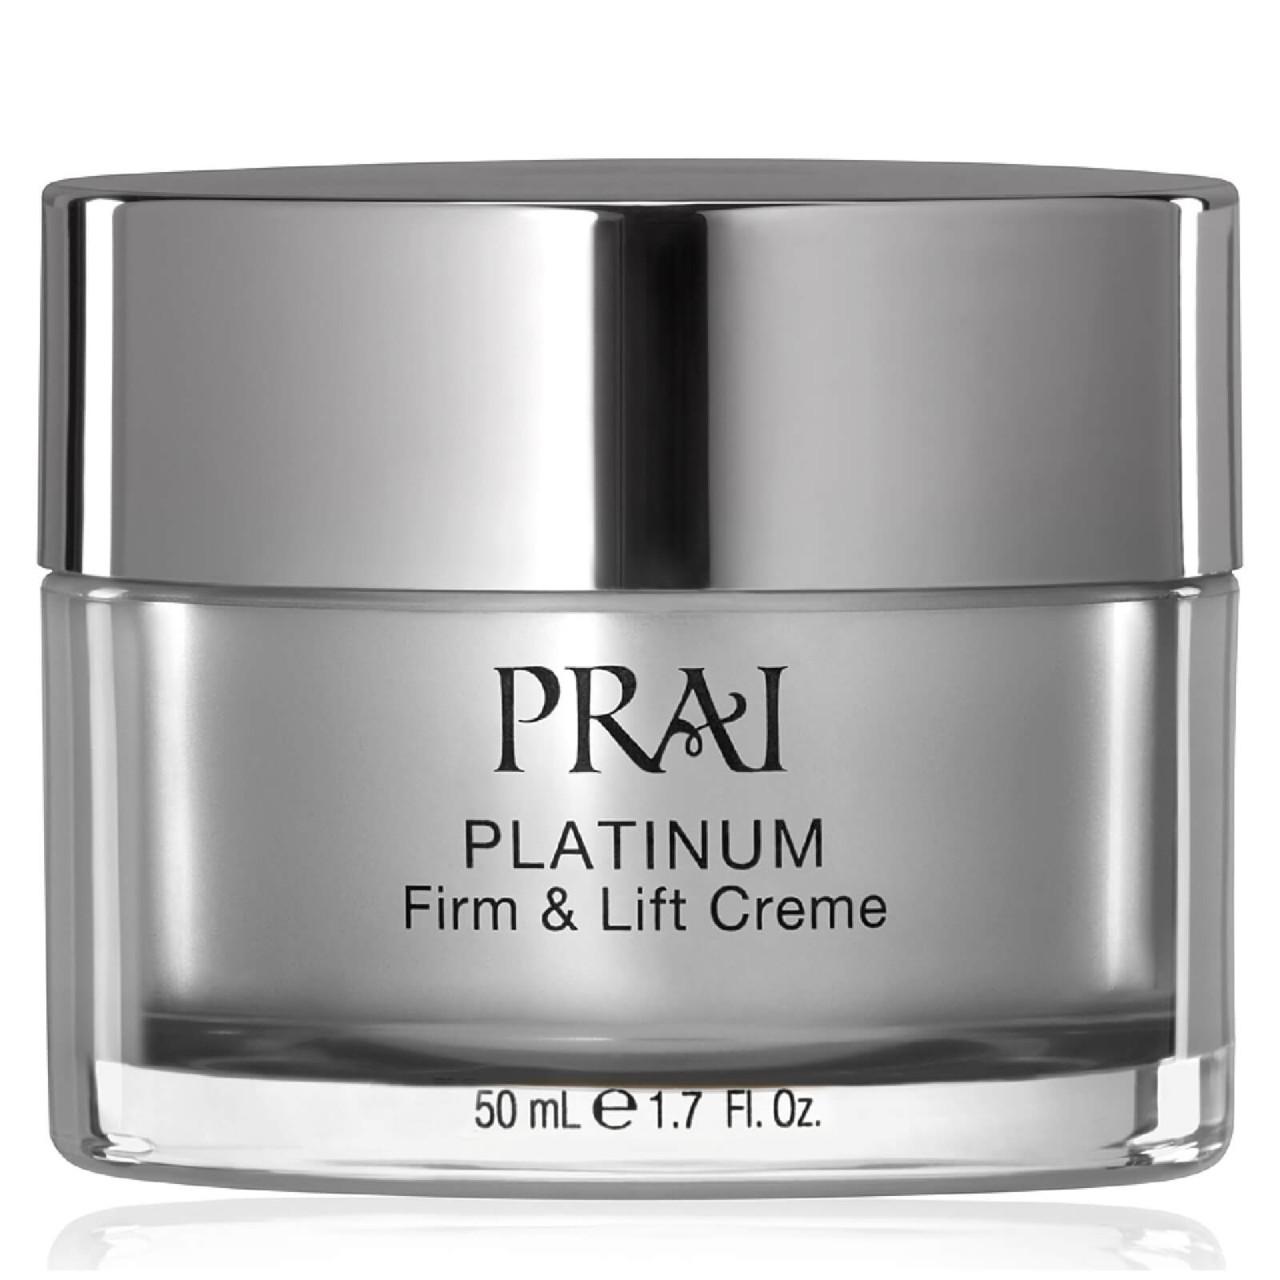 Prai Platinum Firm & Lift Crèm